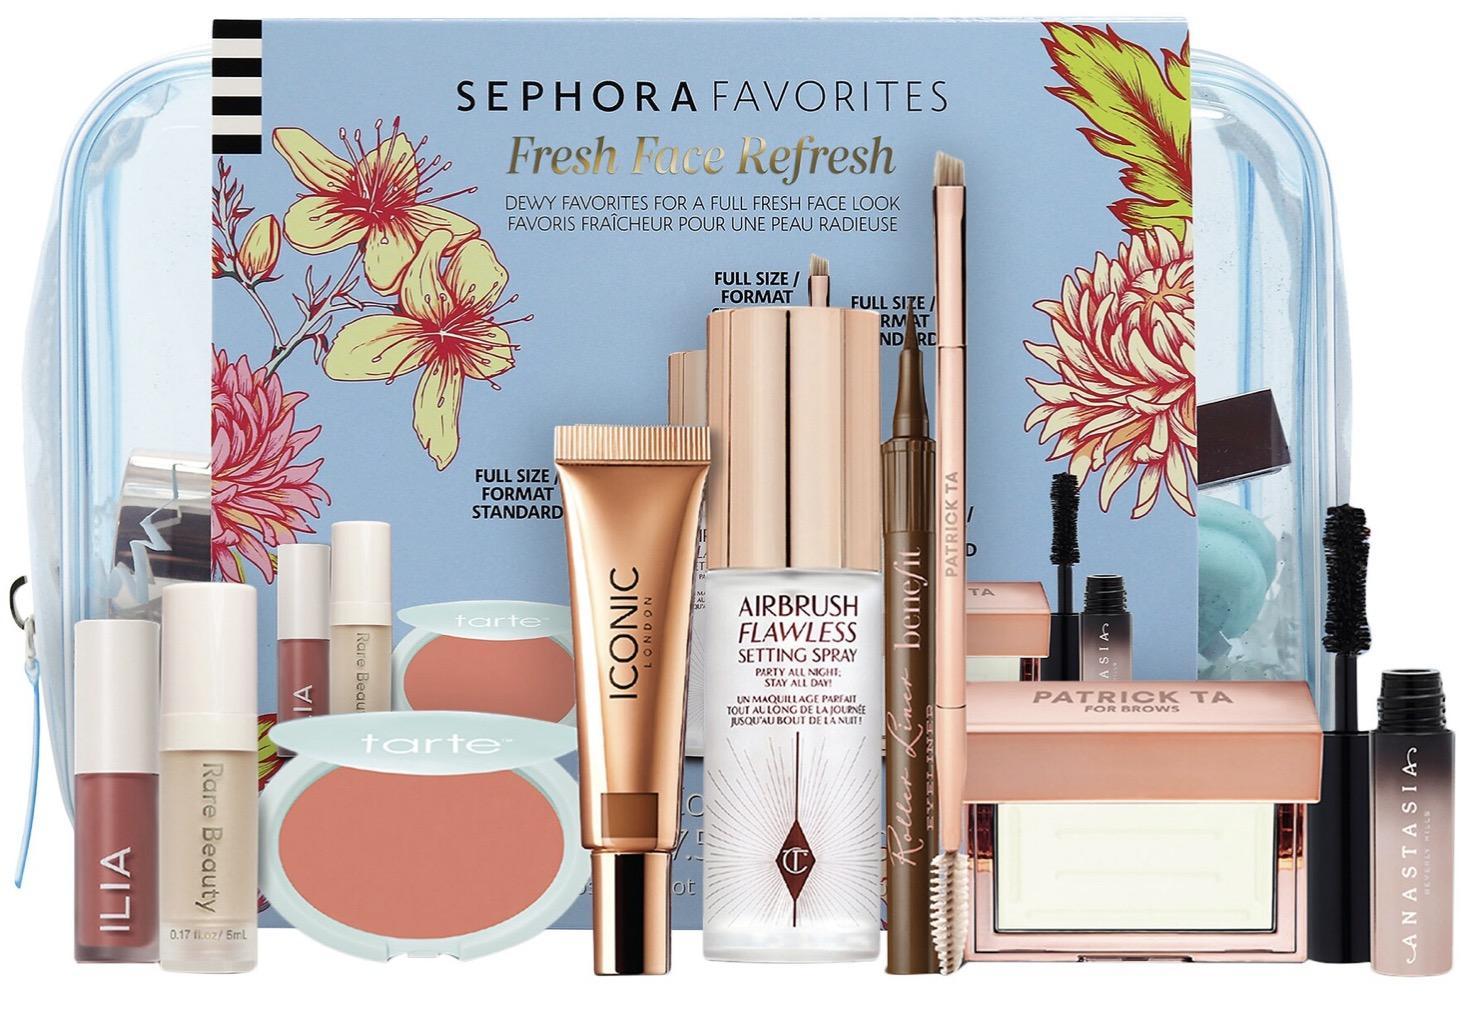 SEPHORA Favorites Fresh Face Refresh Makeup Set – On Sale Now